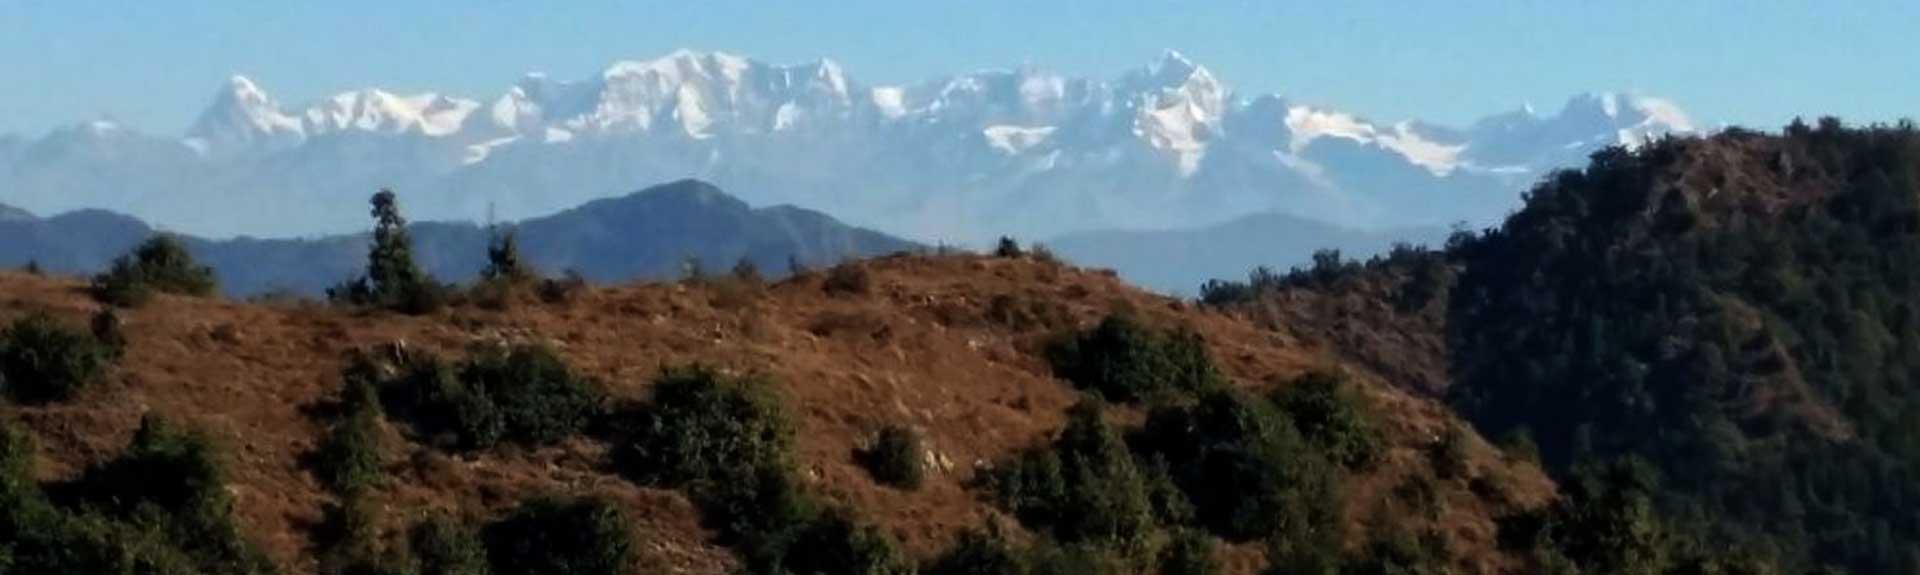 Landour Uttarakhand Tourism Spot